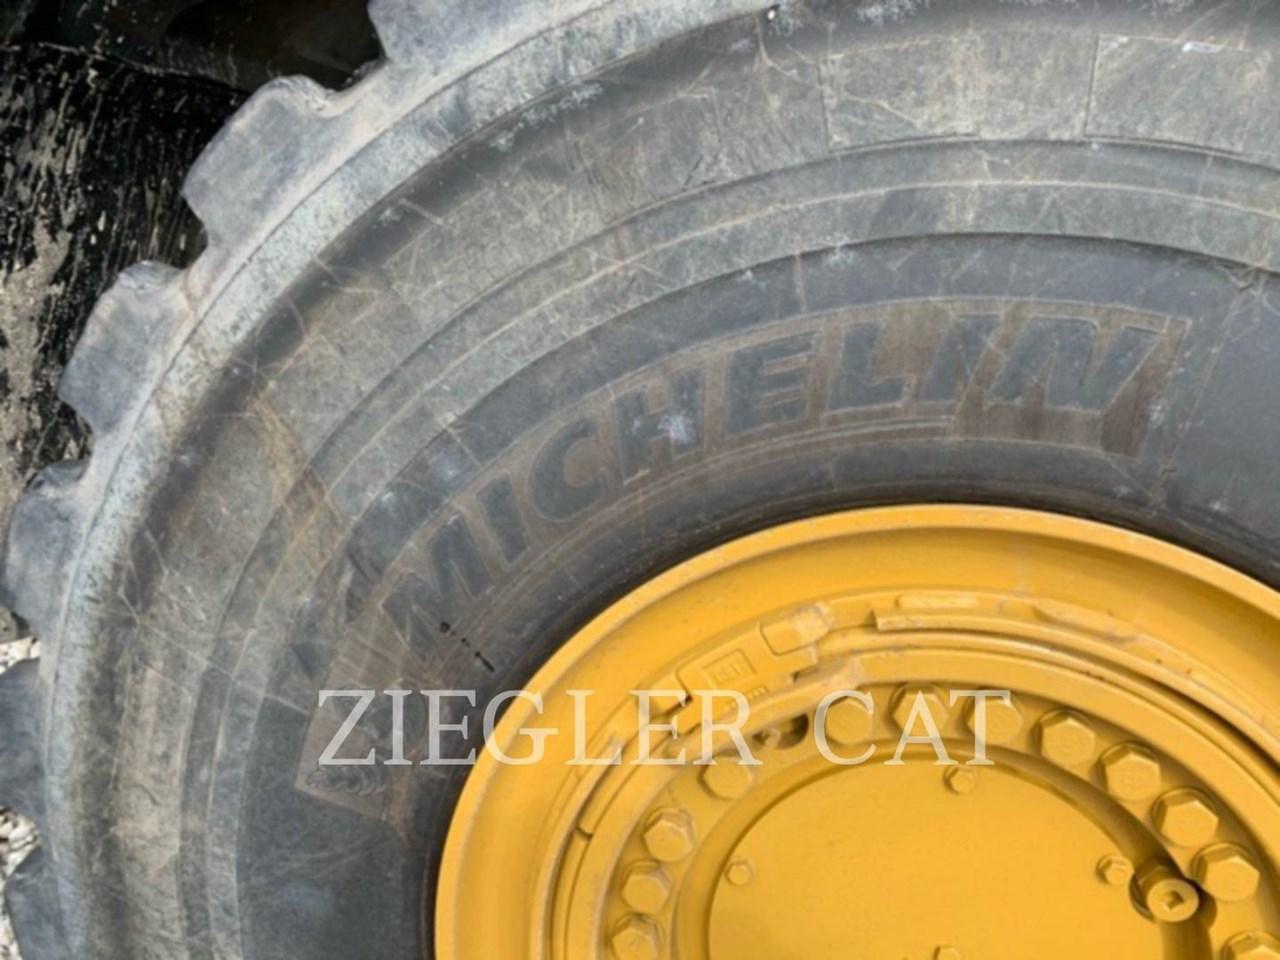 2018 Caterpillar 980M Image 13